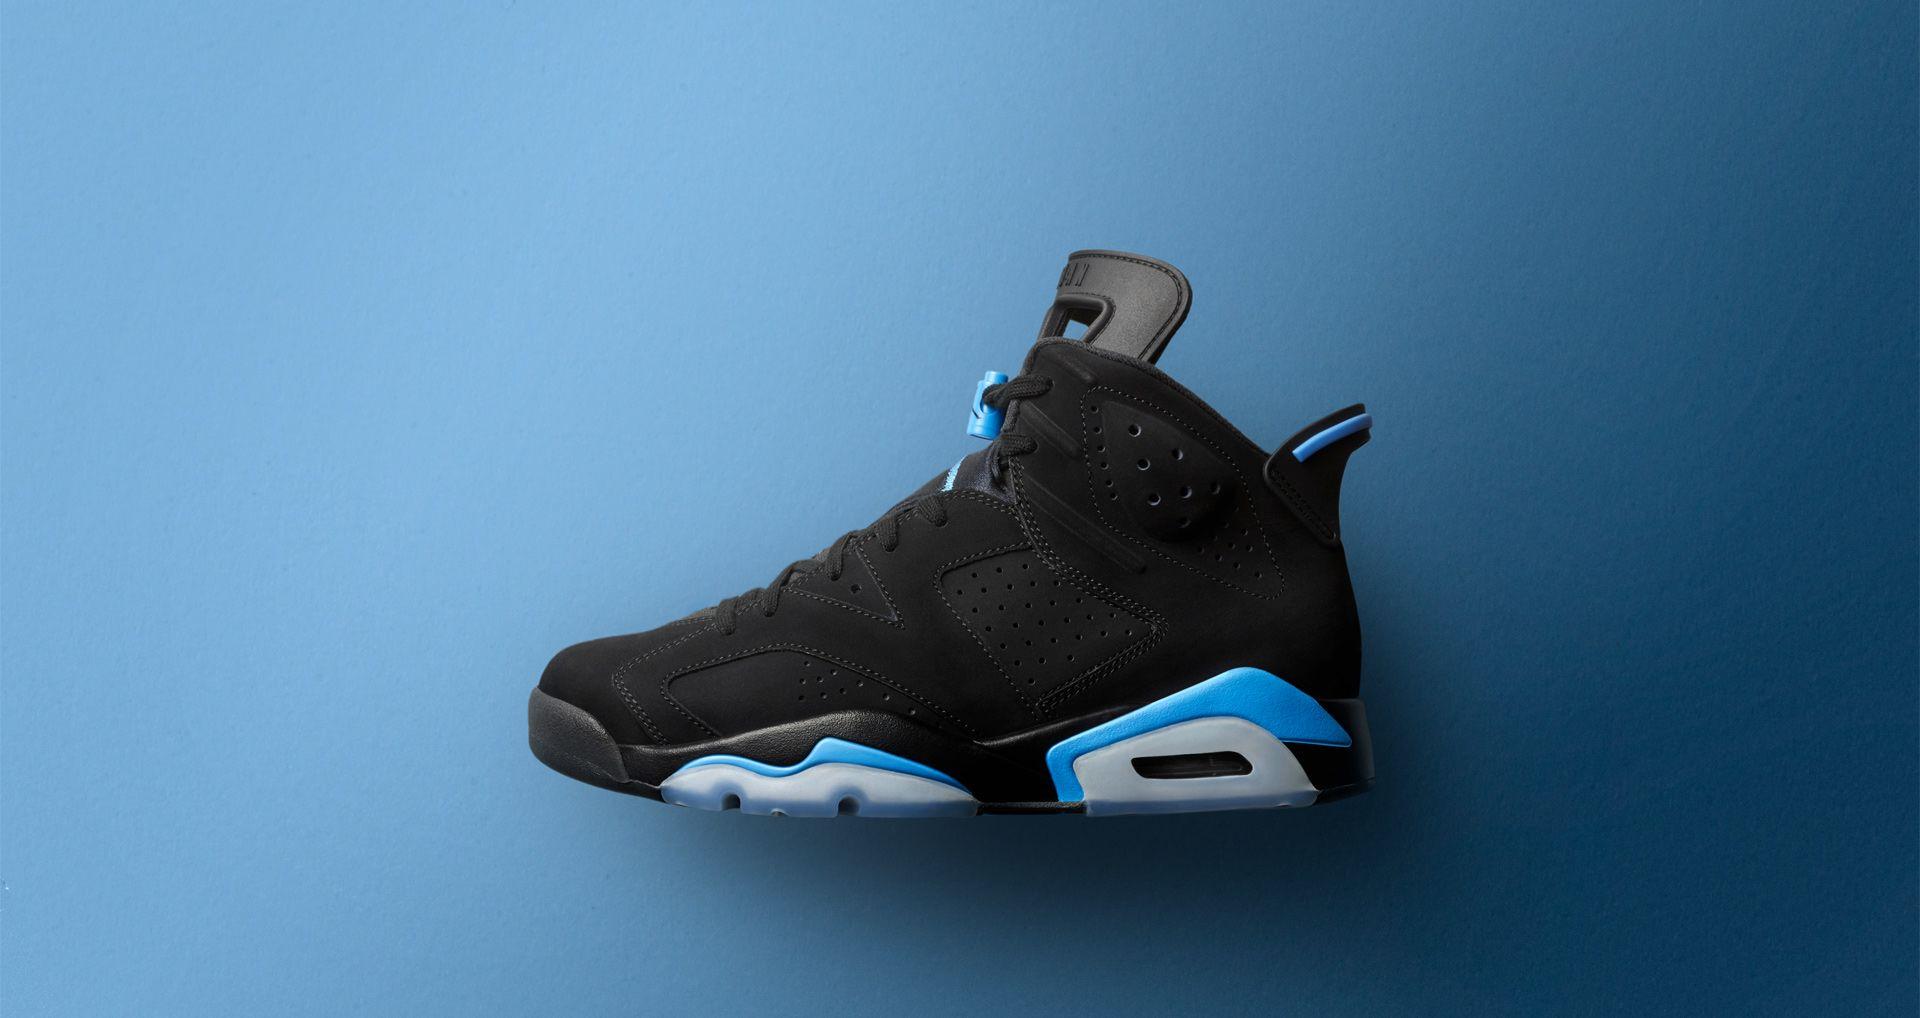 2dfd90bca248 Air Jordan 6  Black   University Blue  Release Date. Nike+ SNKRS